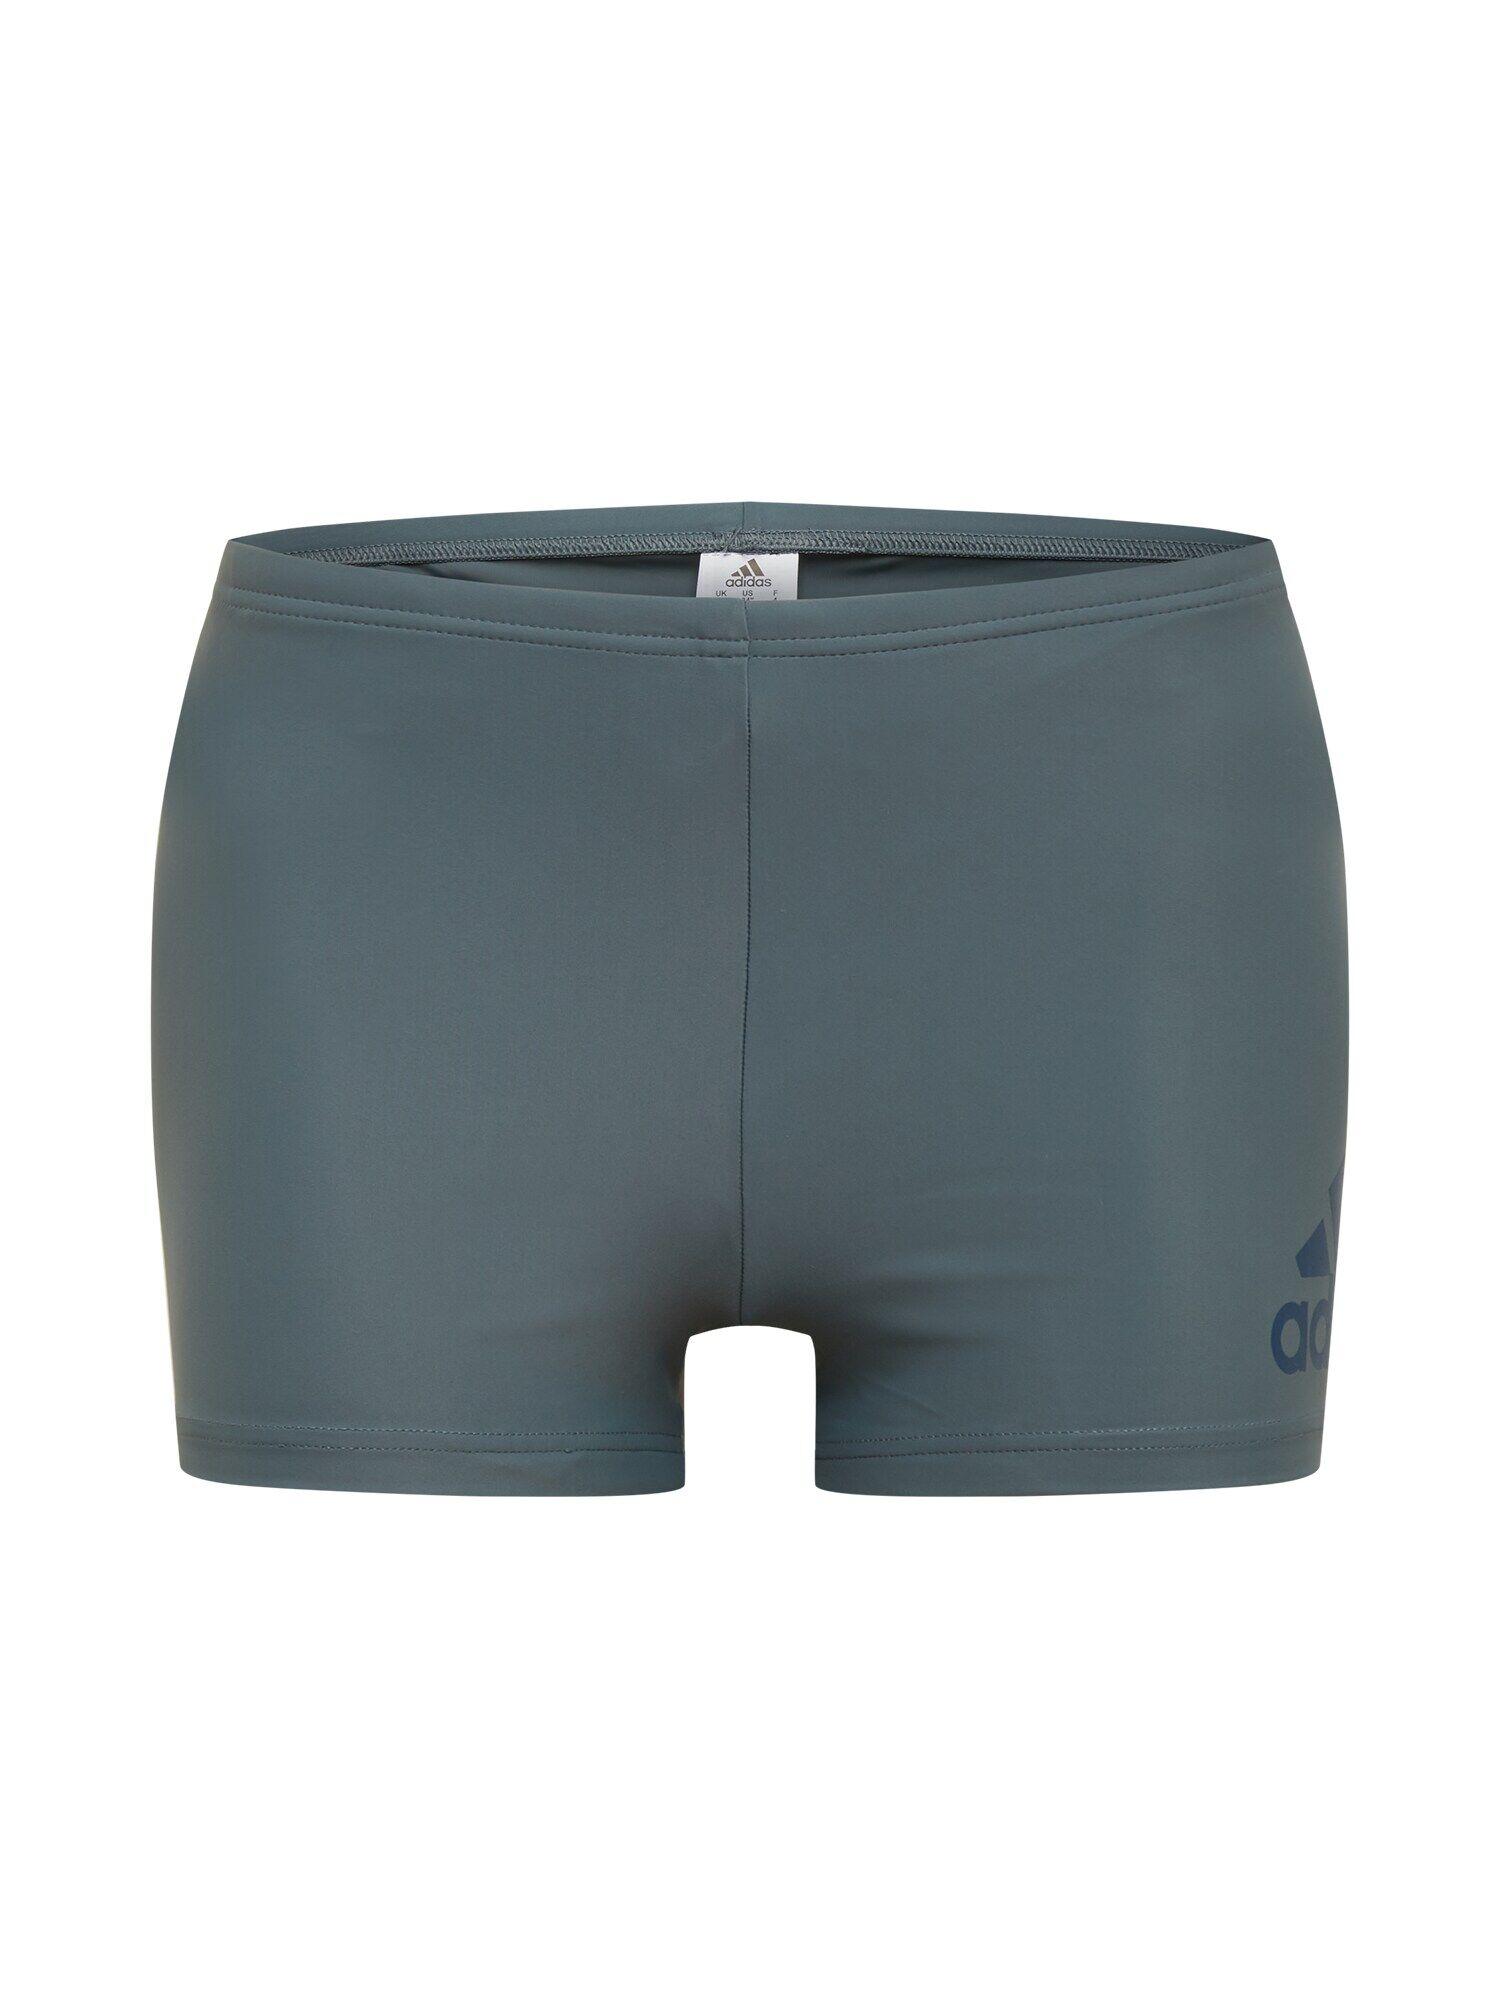 ADIDAS PERFORMANCE Maillot de bain de sport  - Bleu - Taille: 6 - male